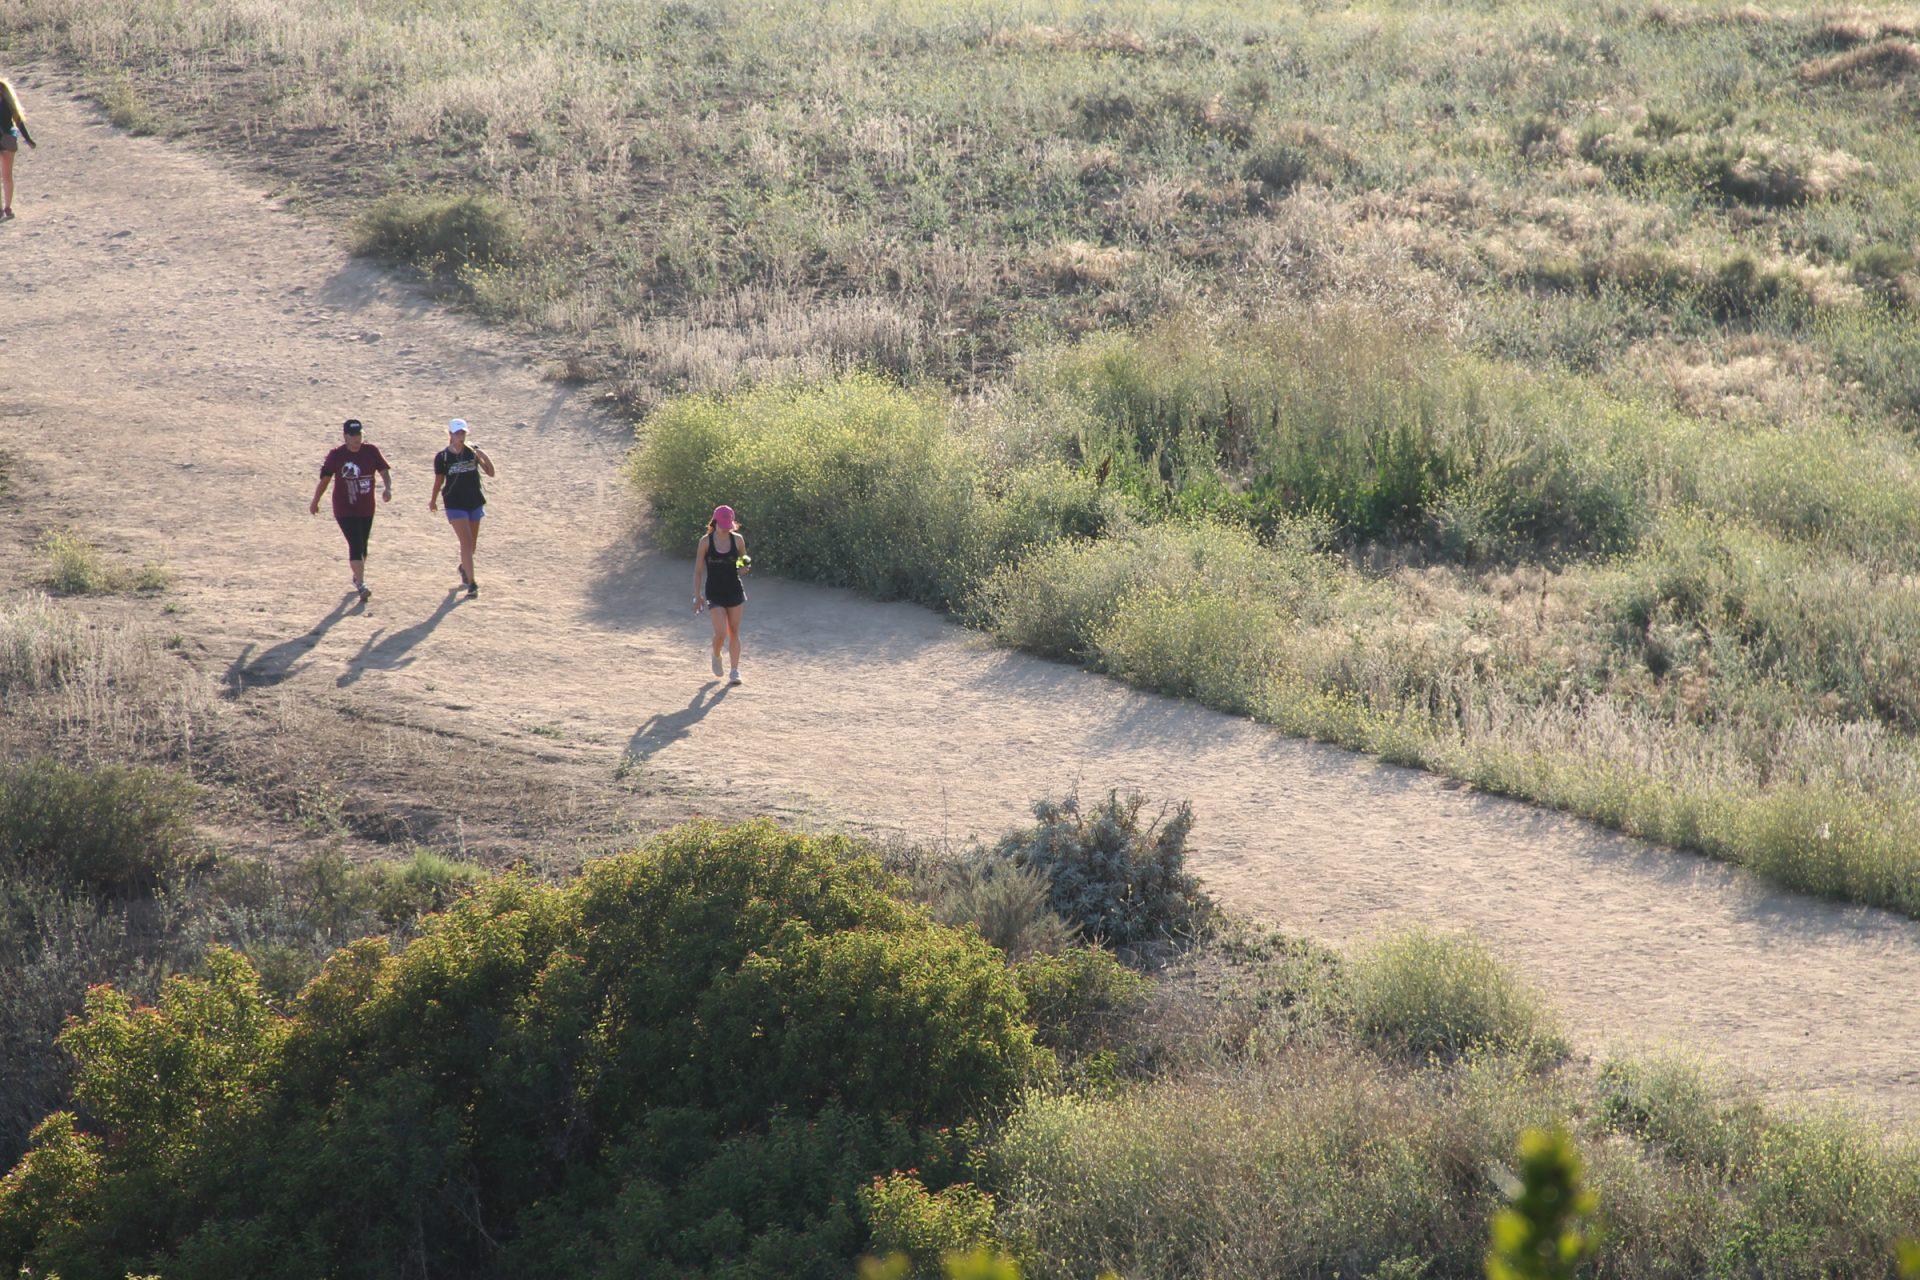 People Walking on Dirt Trail